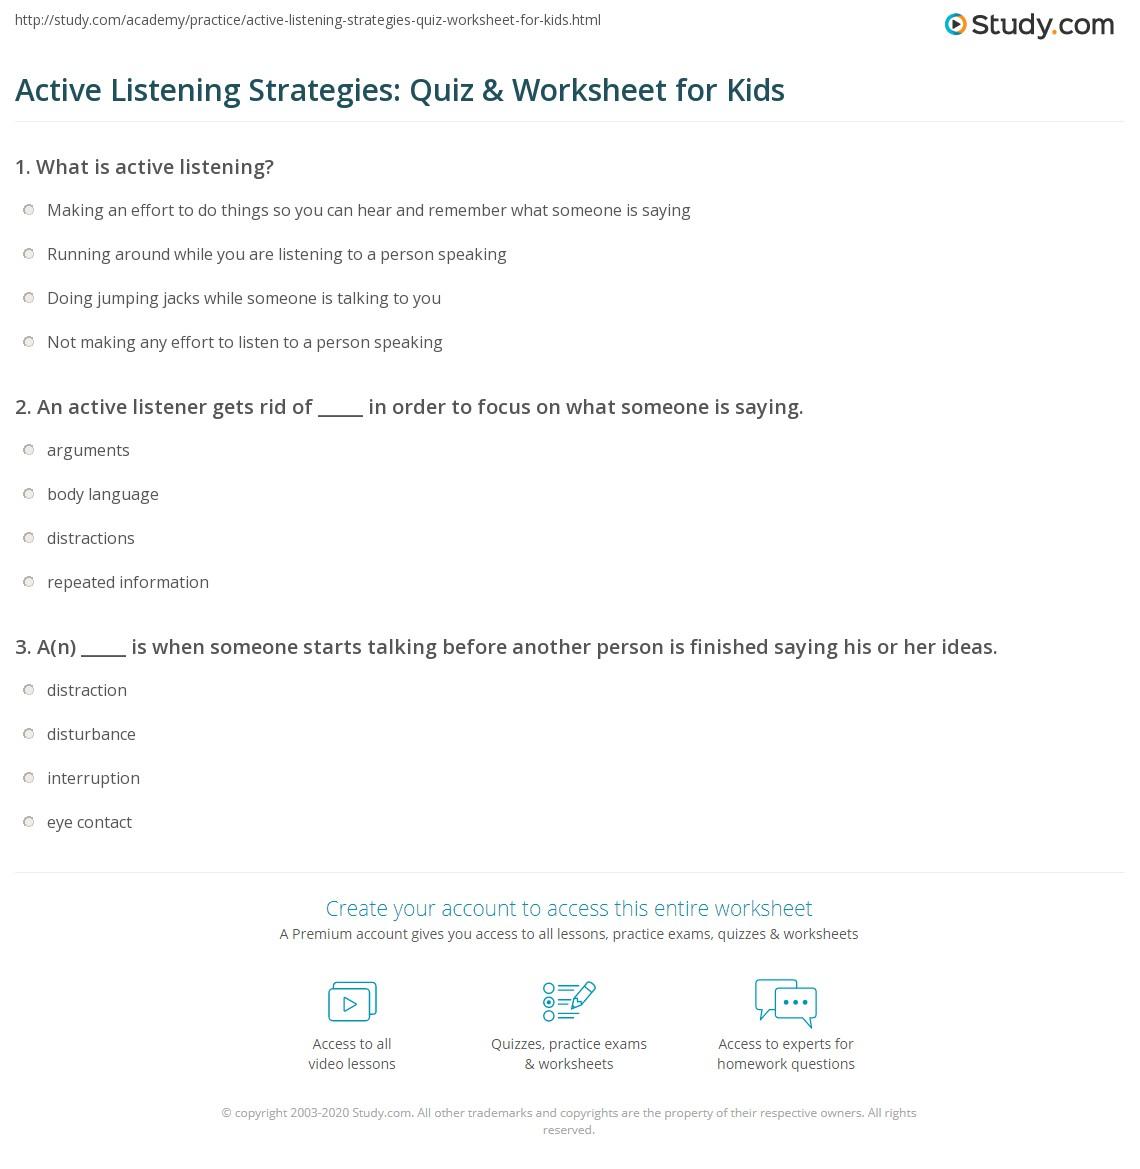 Worksheets Active Reading Strategies Worksheet active listening strategies quiz worksheet for kids study com print worksheet